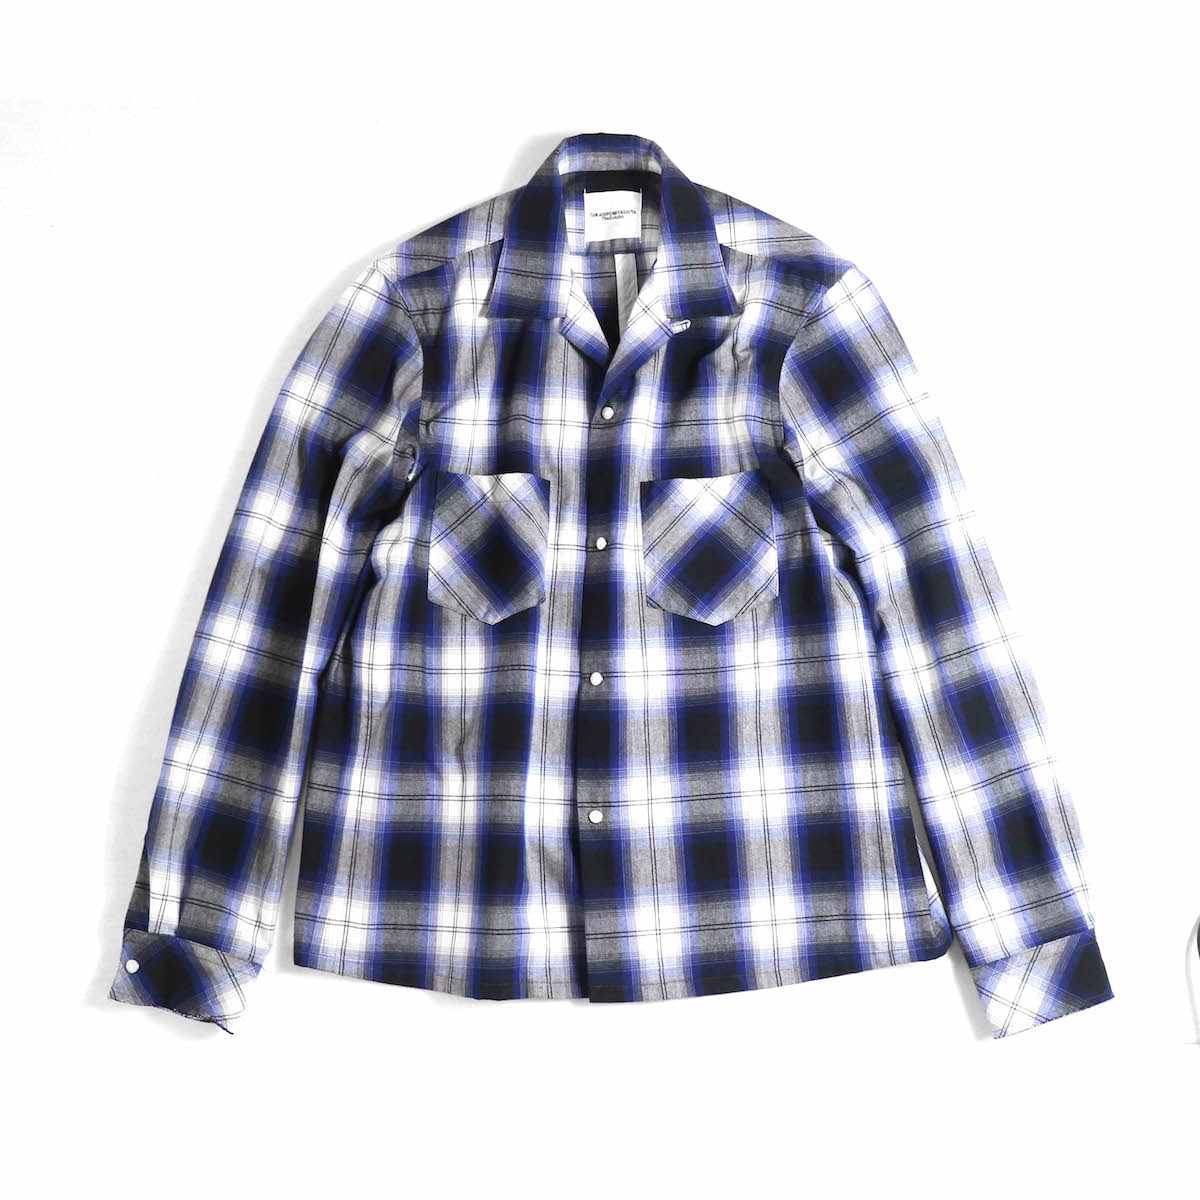 TAKAHIROMIYASHITATheSoloist. / sws.0012bSS18 work shirt. (ombre check) -black × blue